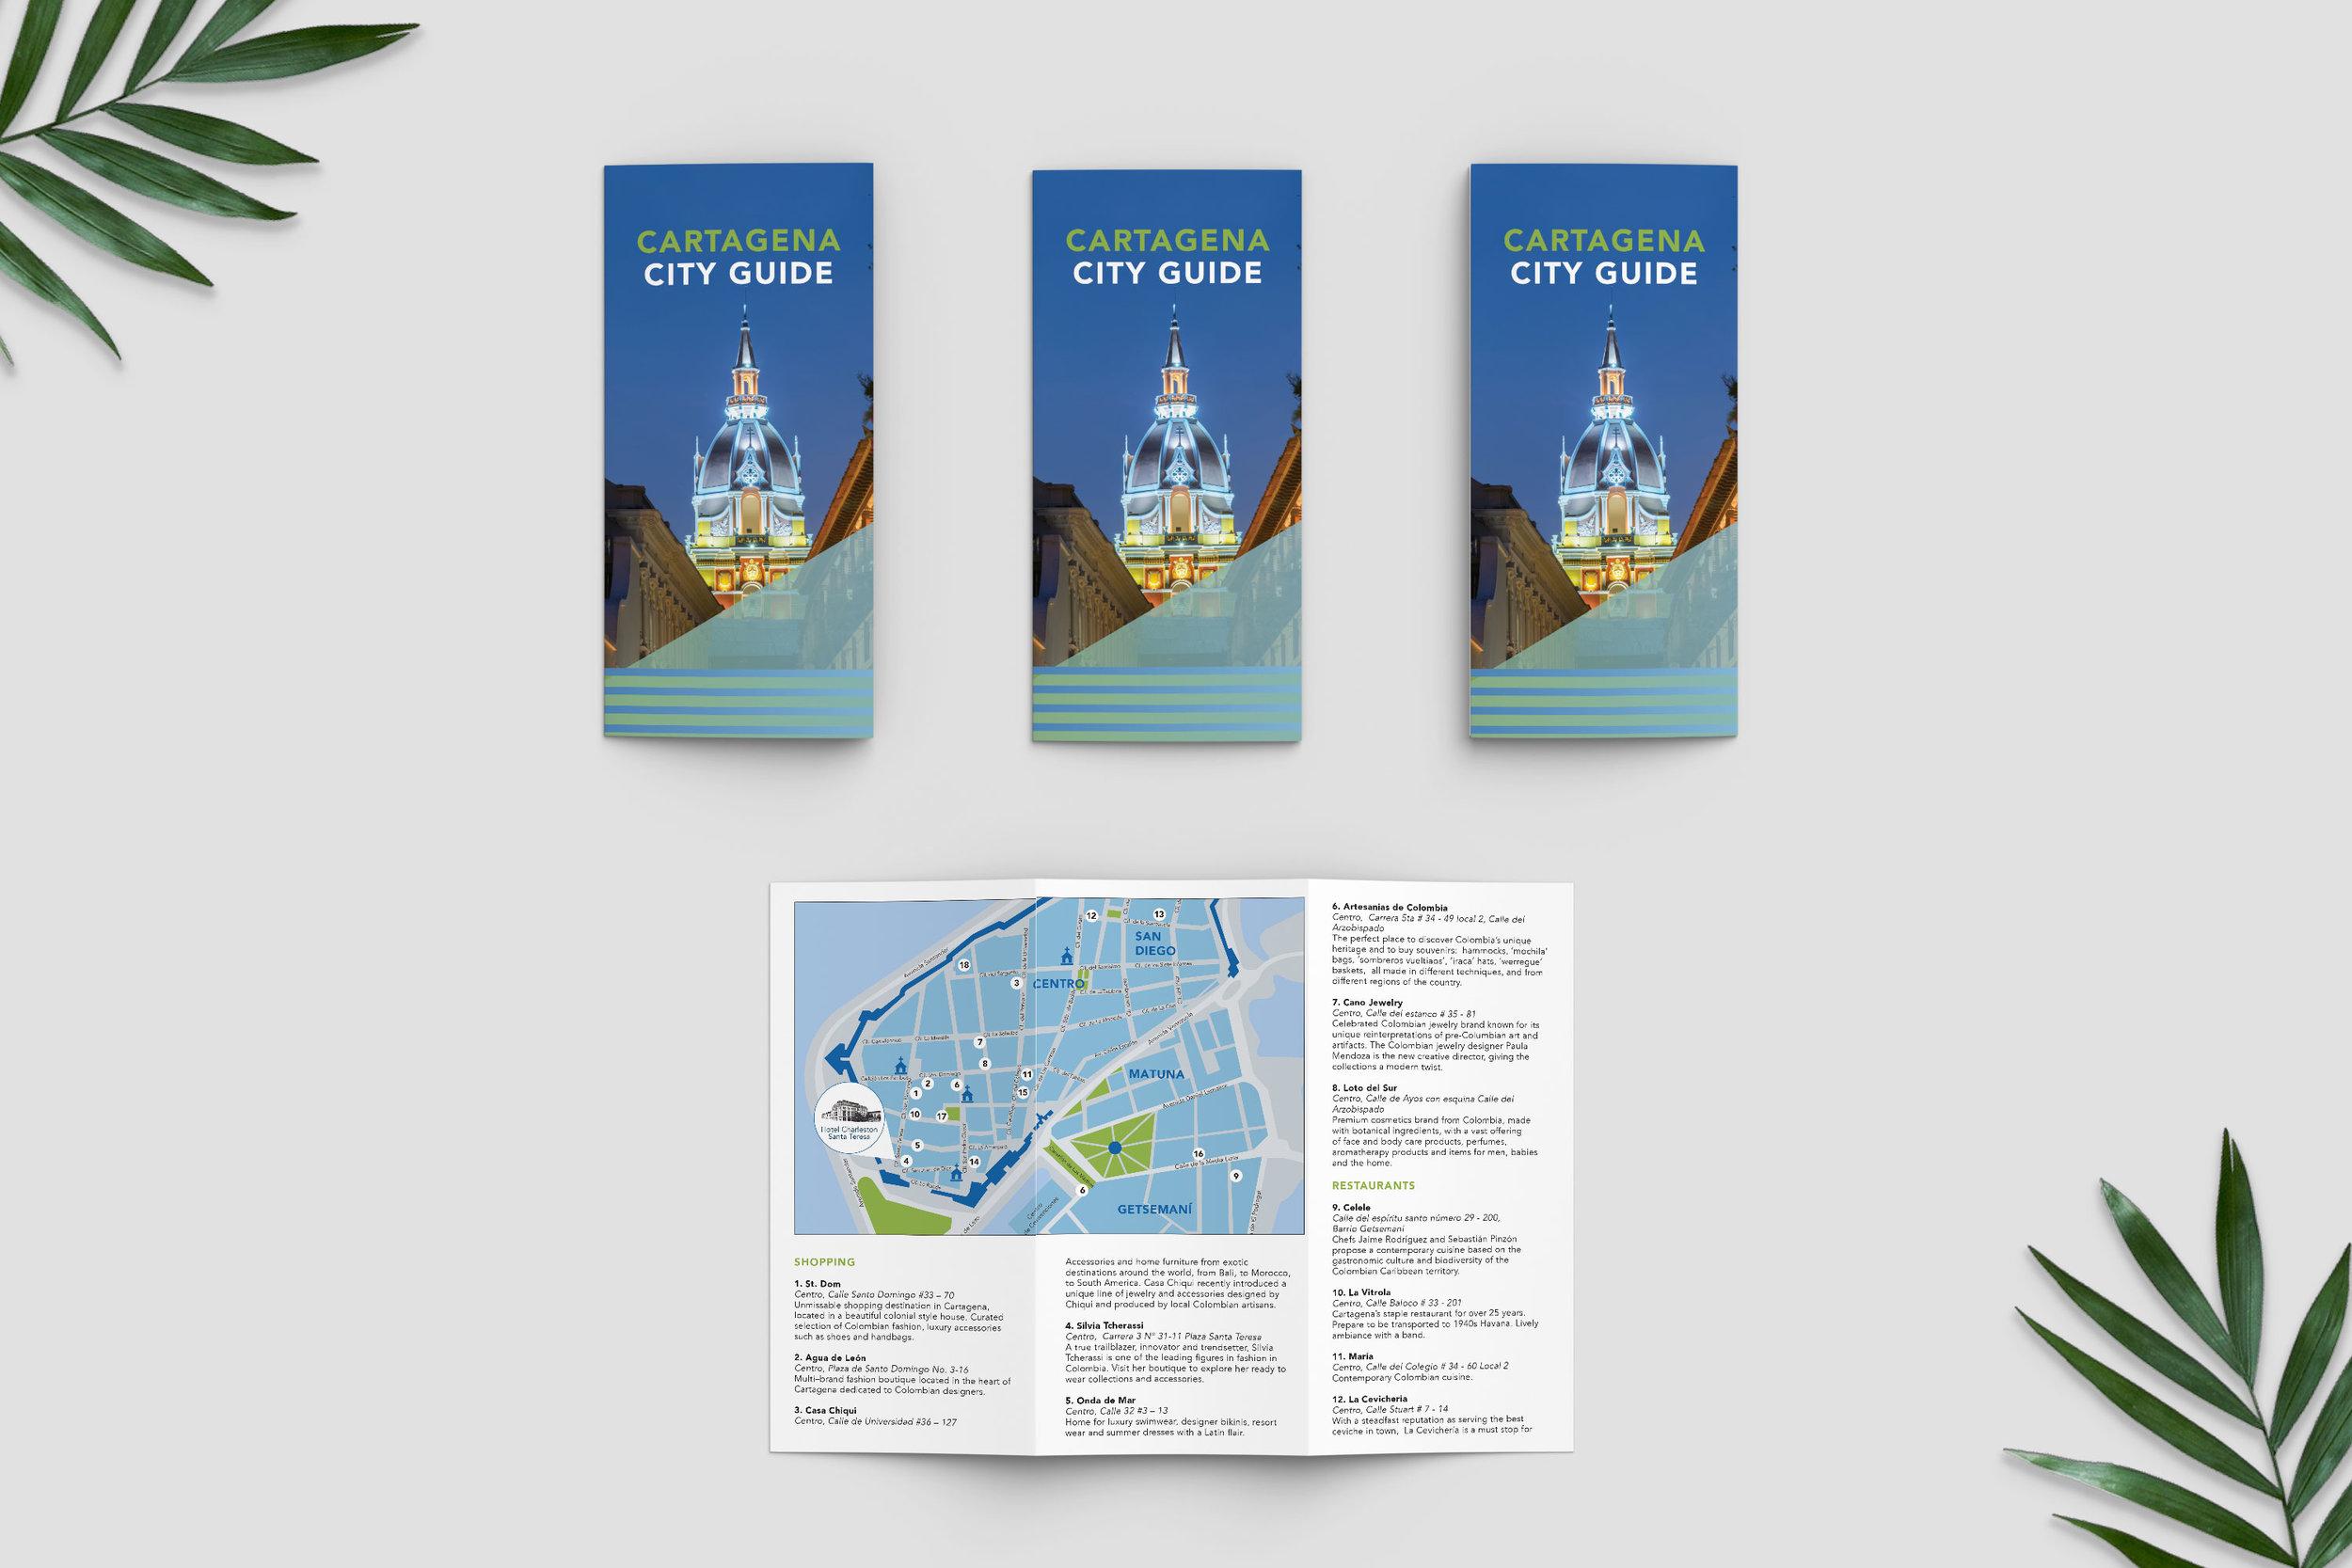 Cartagena city guide-trifold brochures